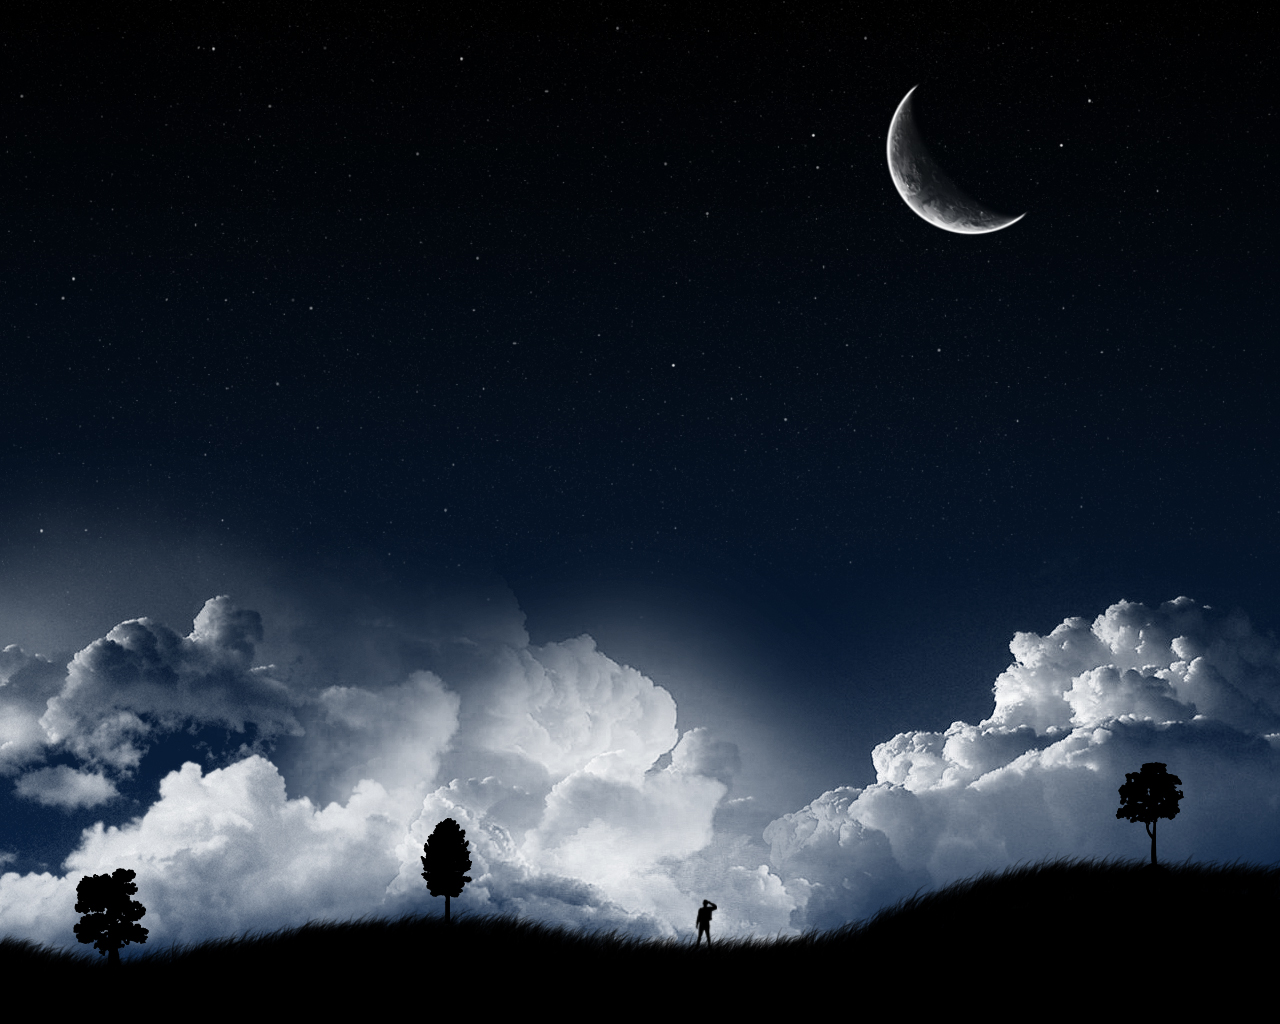 Beautiful Night Sky wallpaper 1280x1024